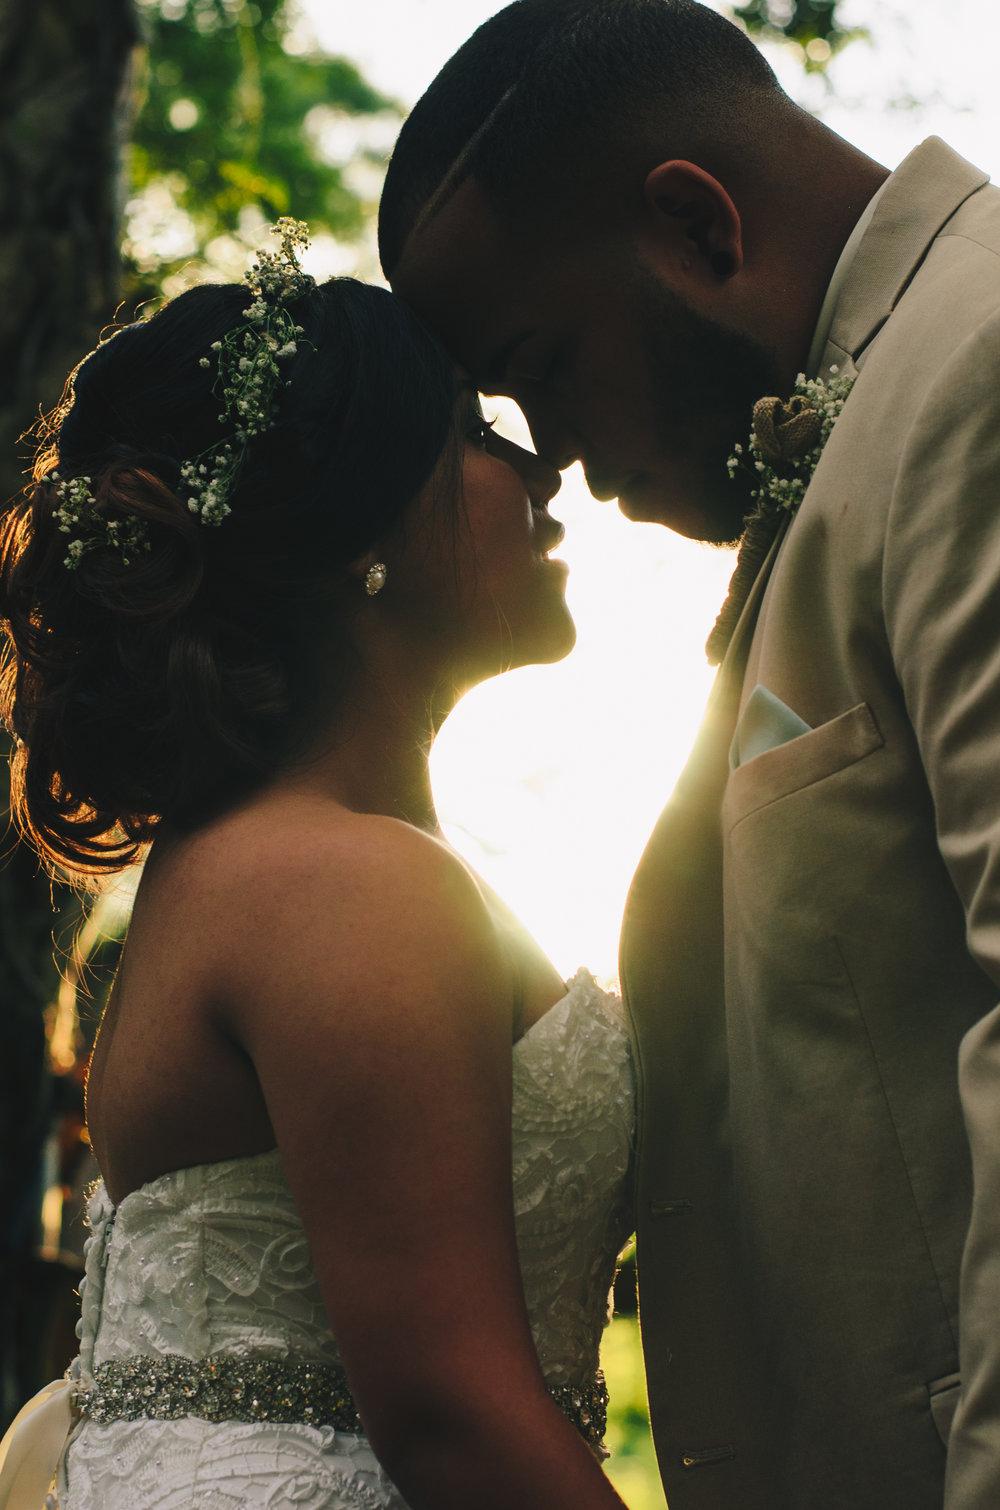 central-fl-christian-wedding-day-28.jpg